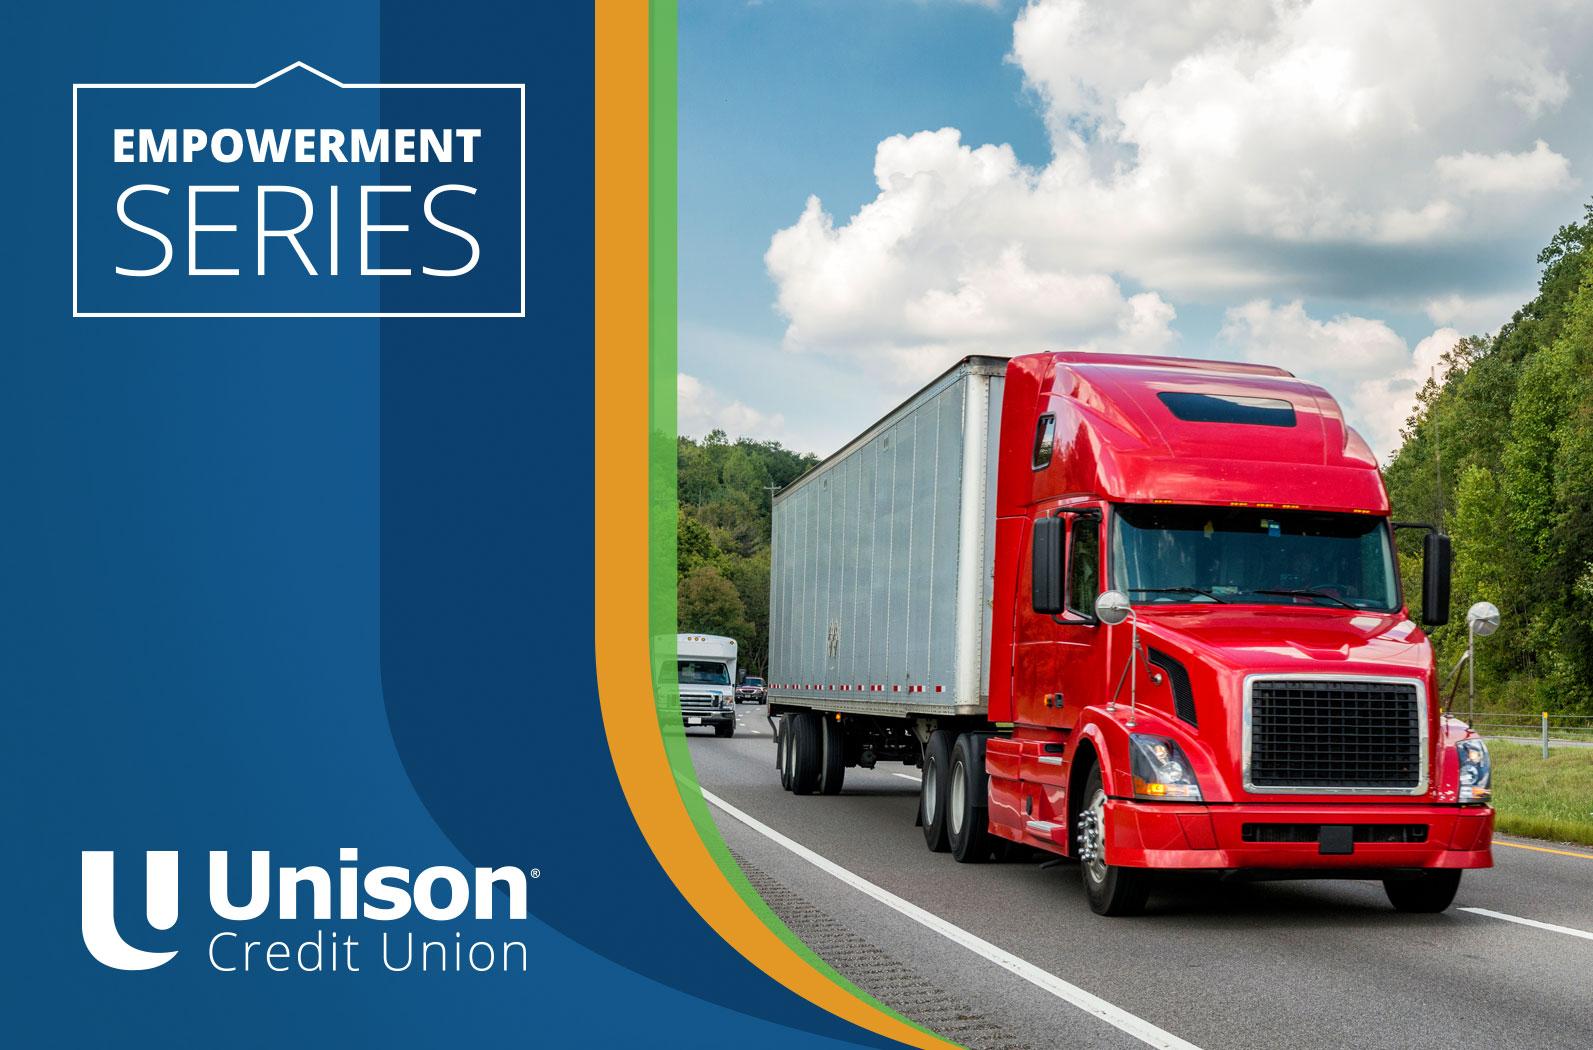 empowerment series truck driver financing